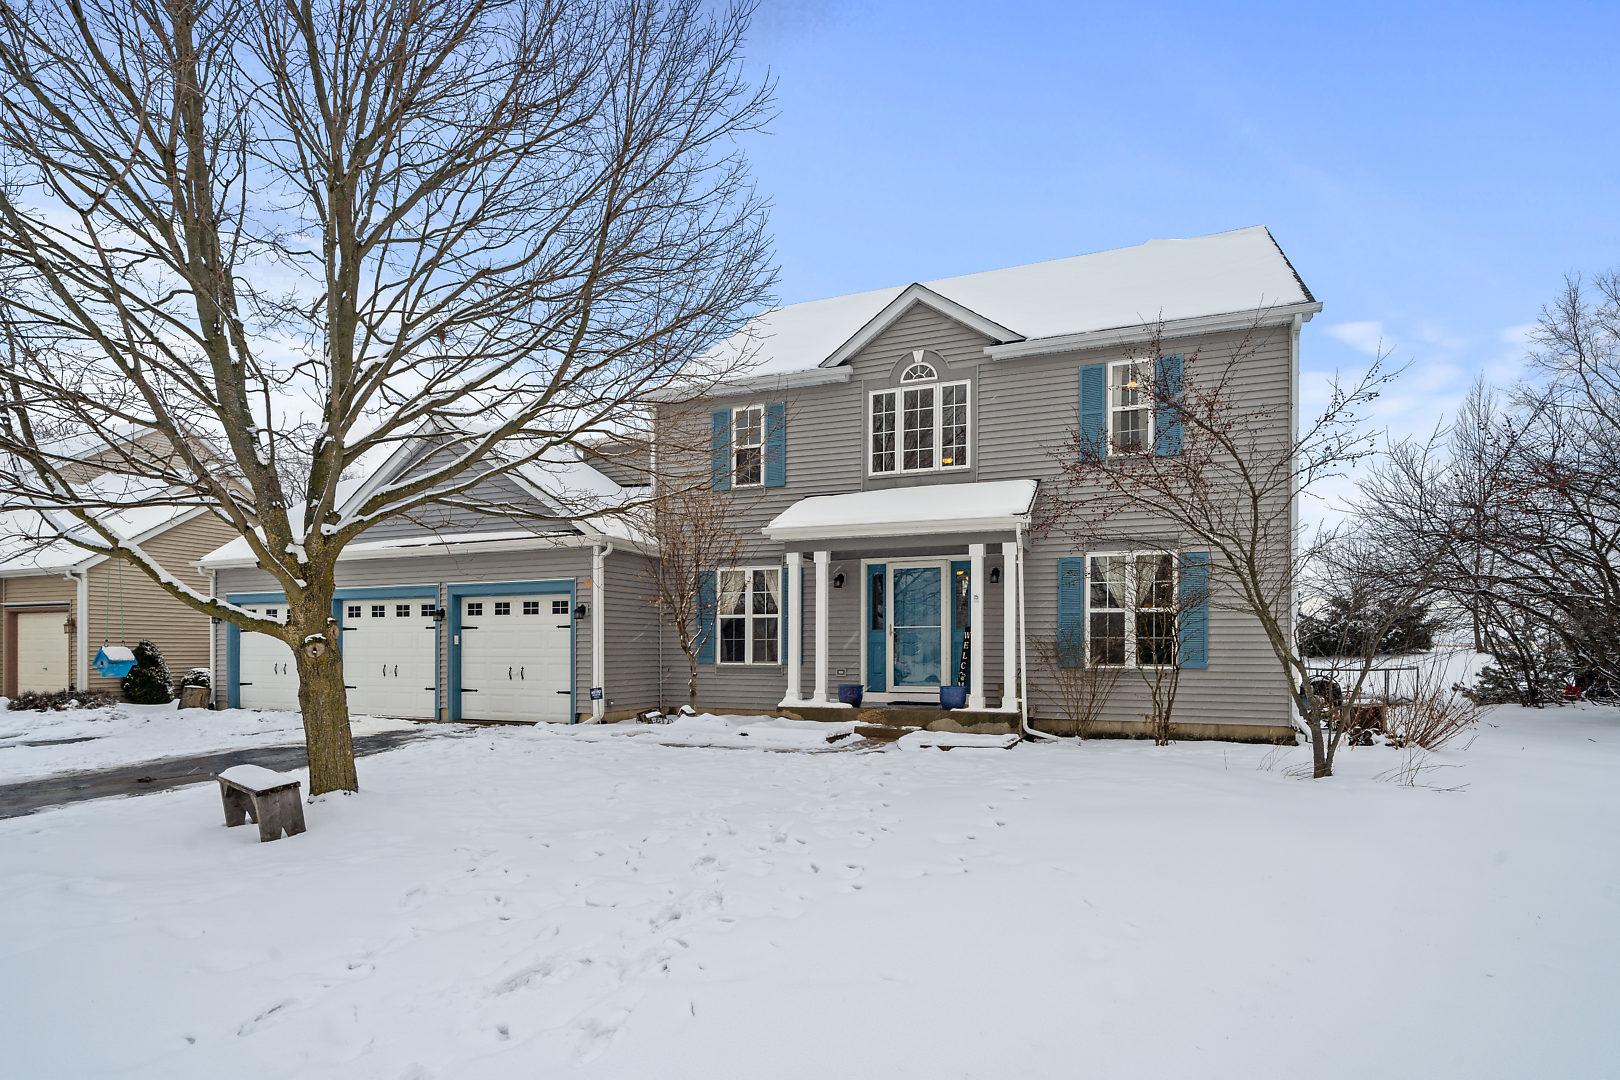 1443 Foxmoor Lane 60123 - One of Elgin Homes for Sale